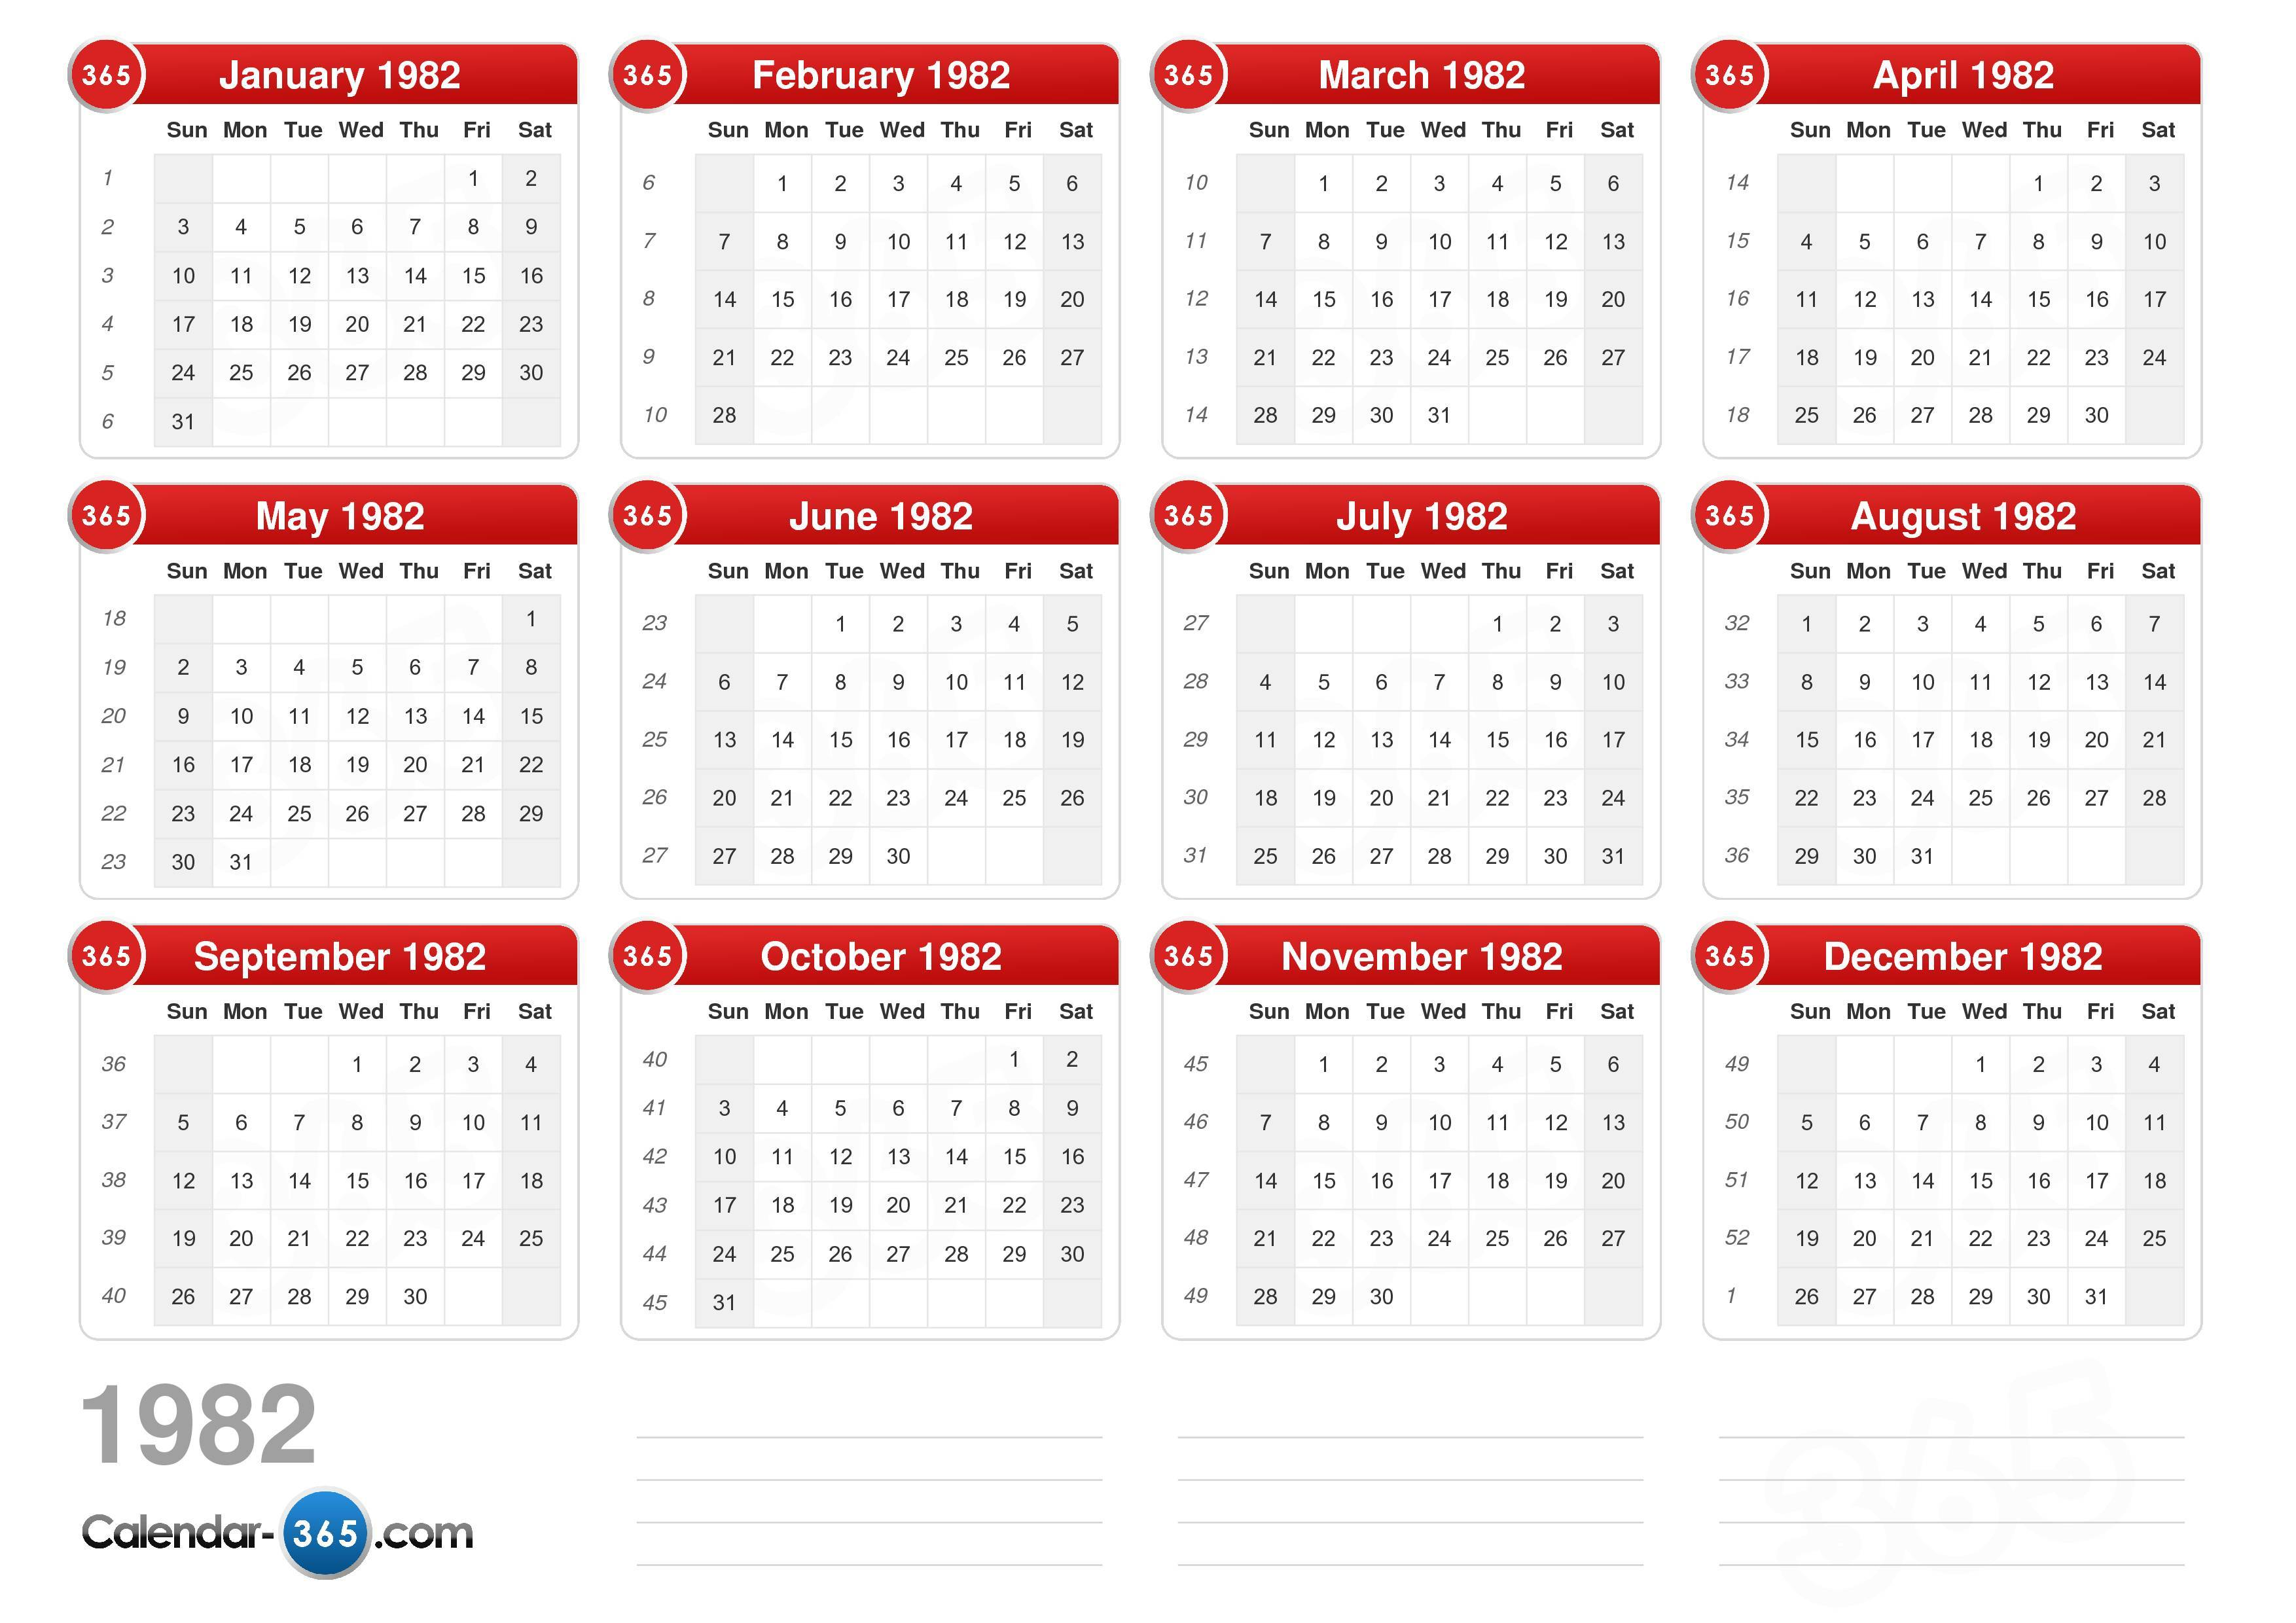 ... calendar without holidays landscape format 1 page 1982 calendar 169 2